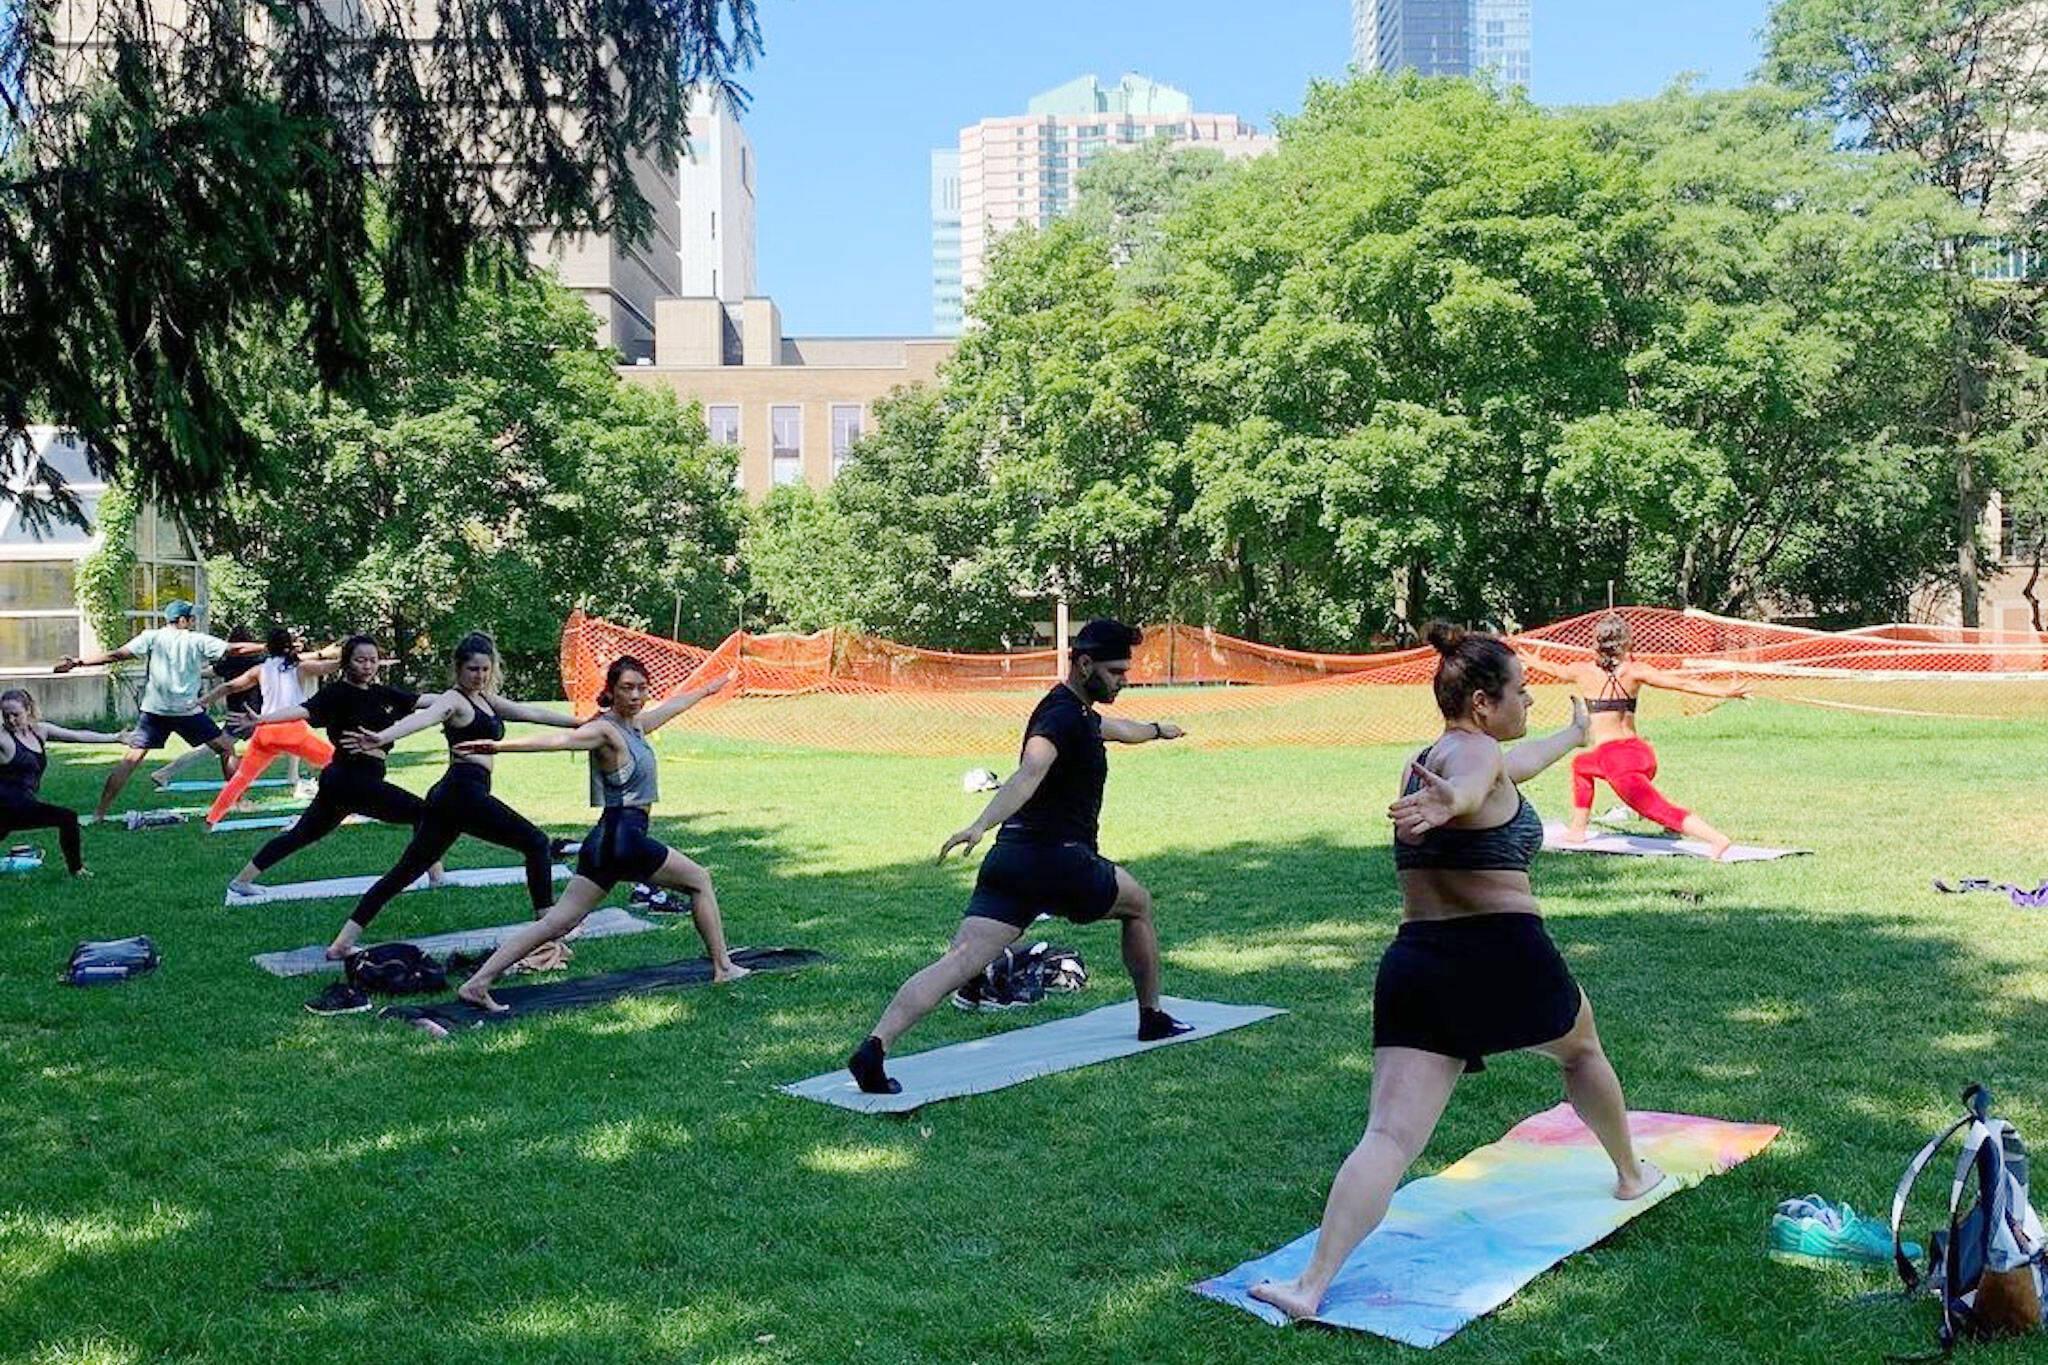 outdoor fitness classes toronto